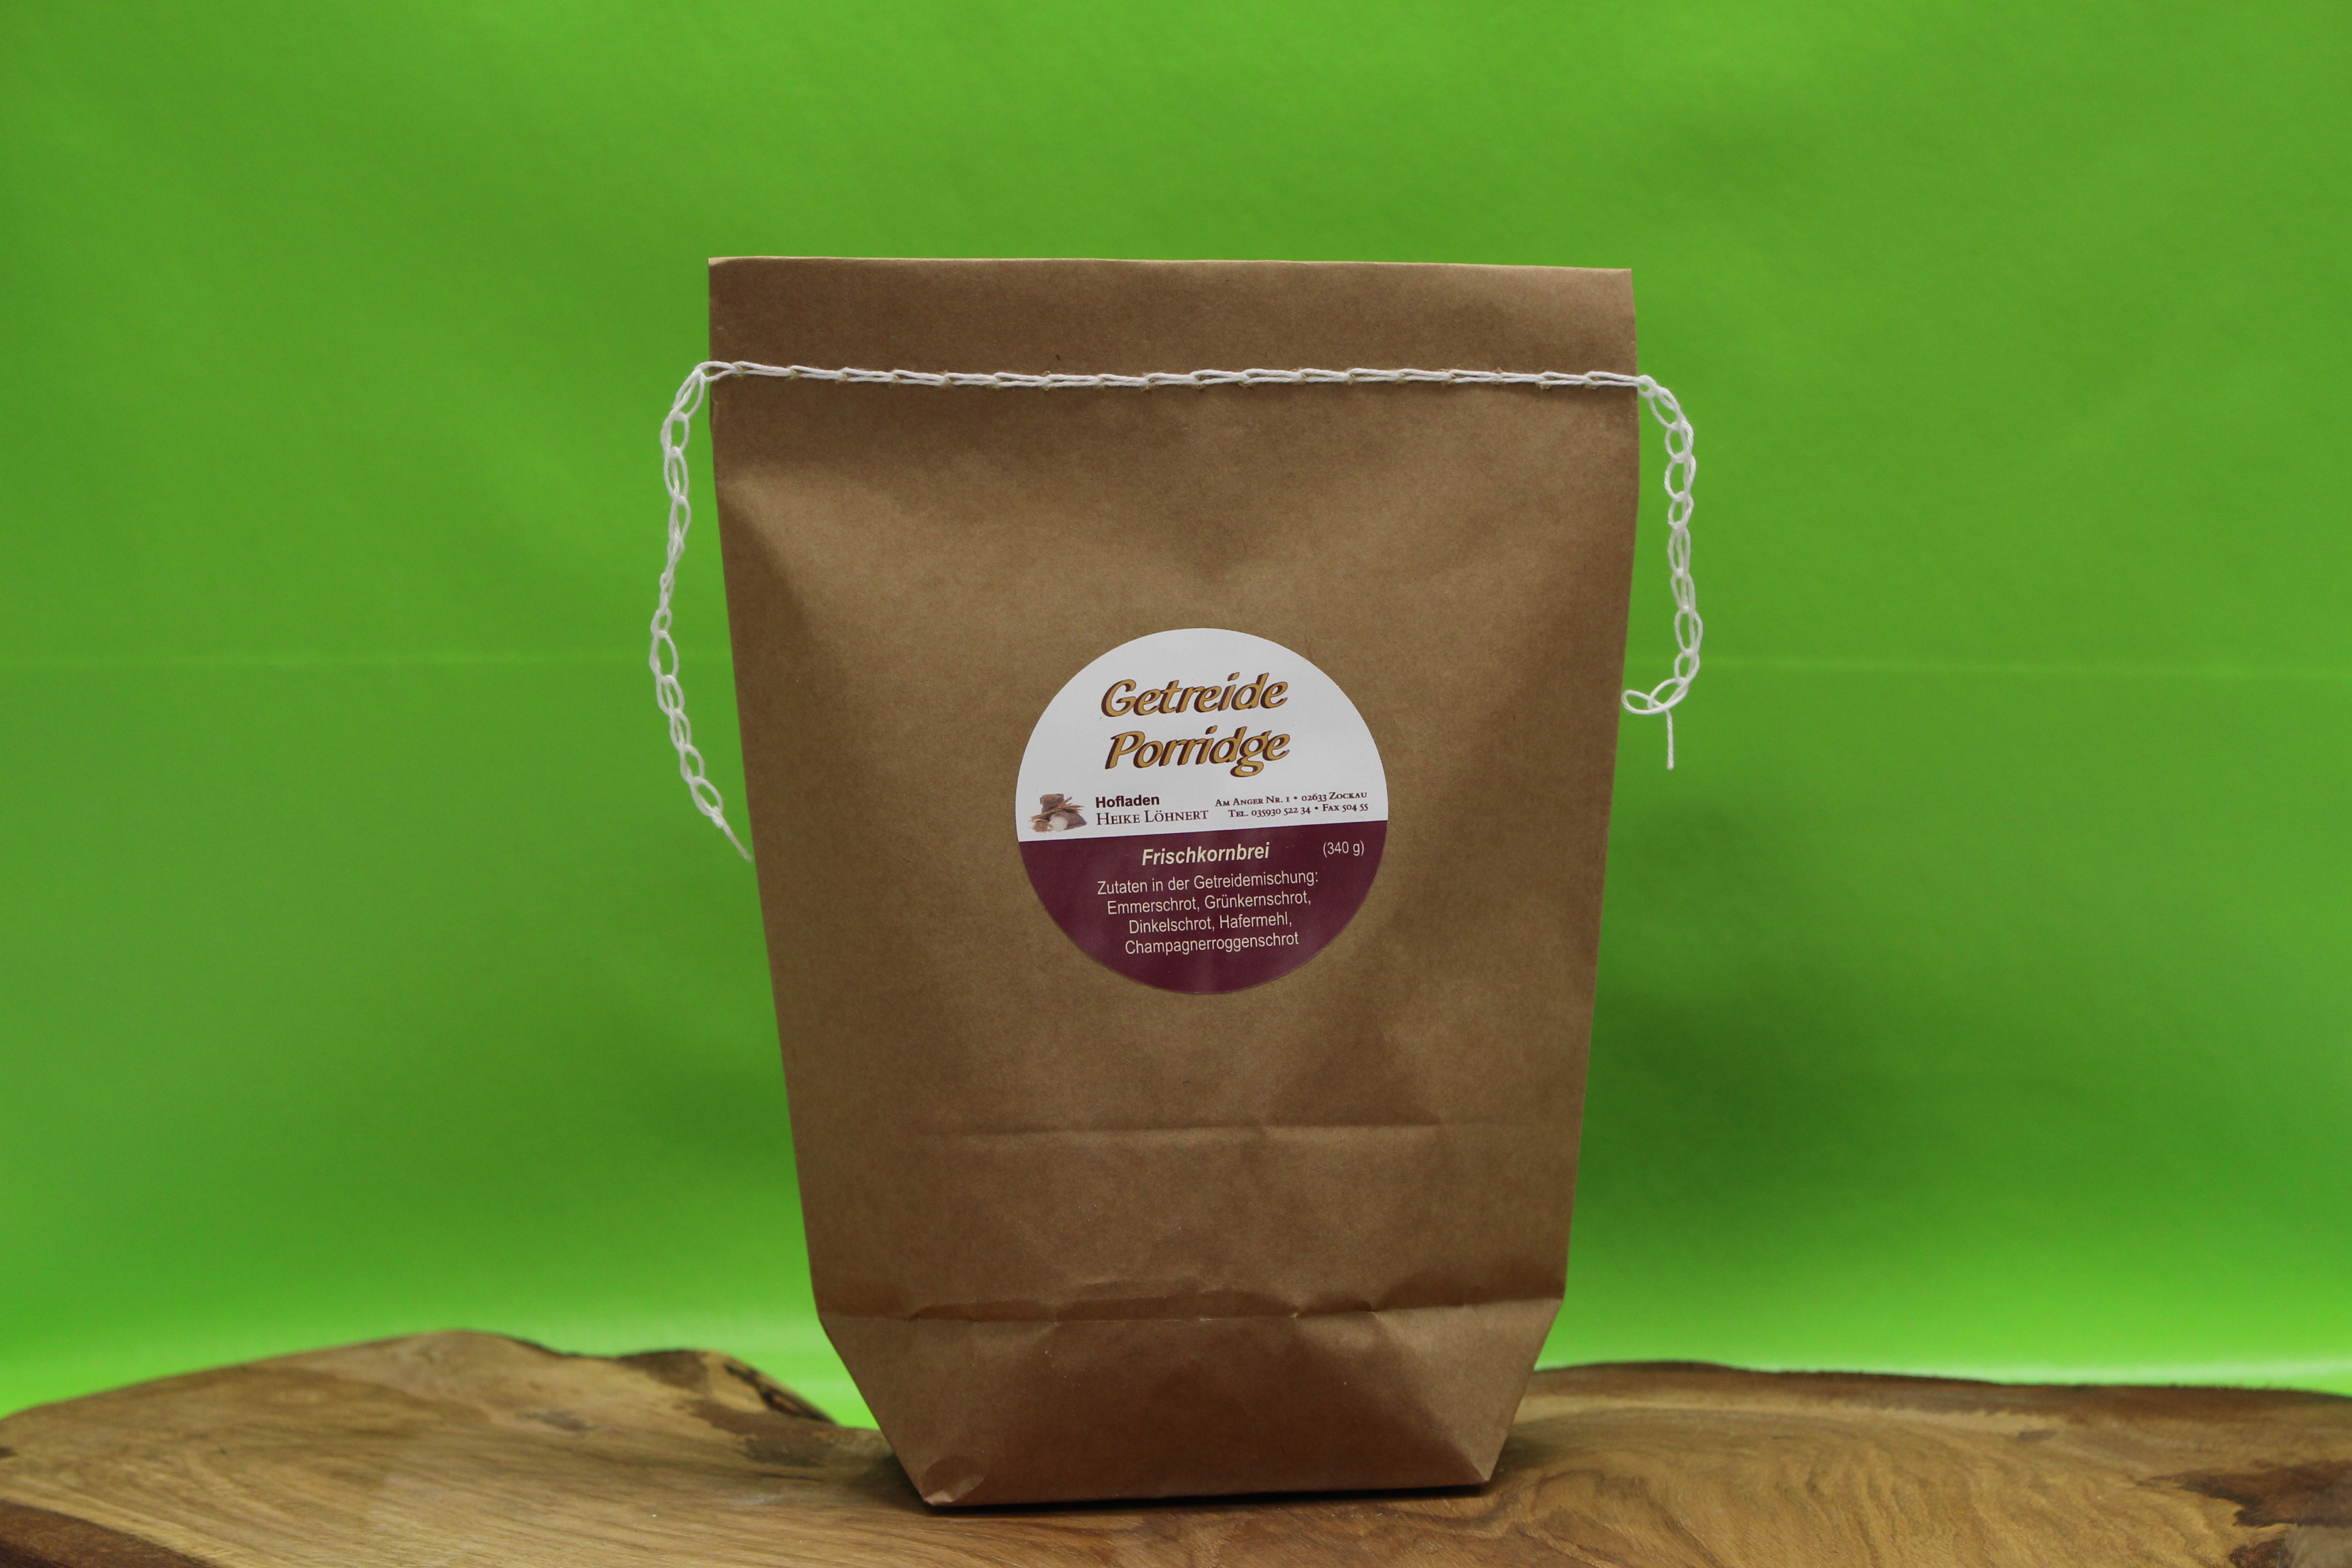 Getreide Porridge